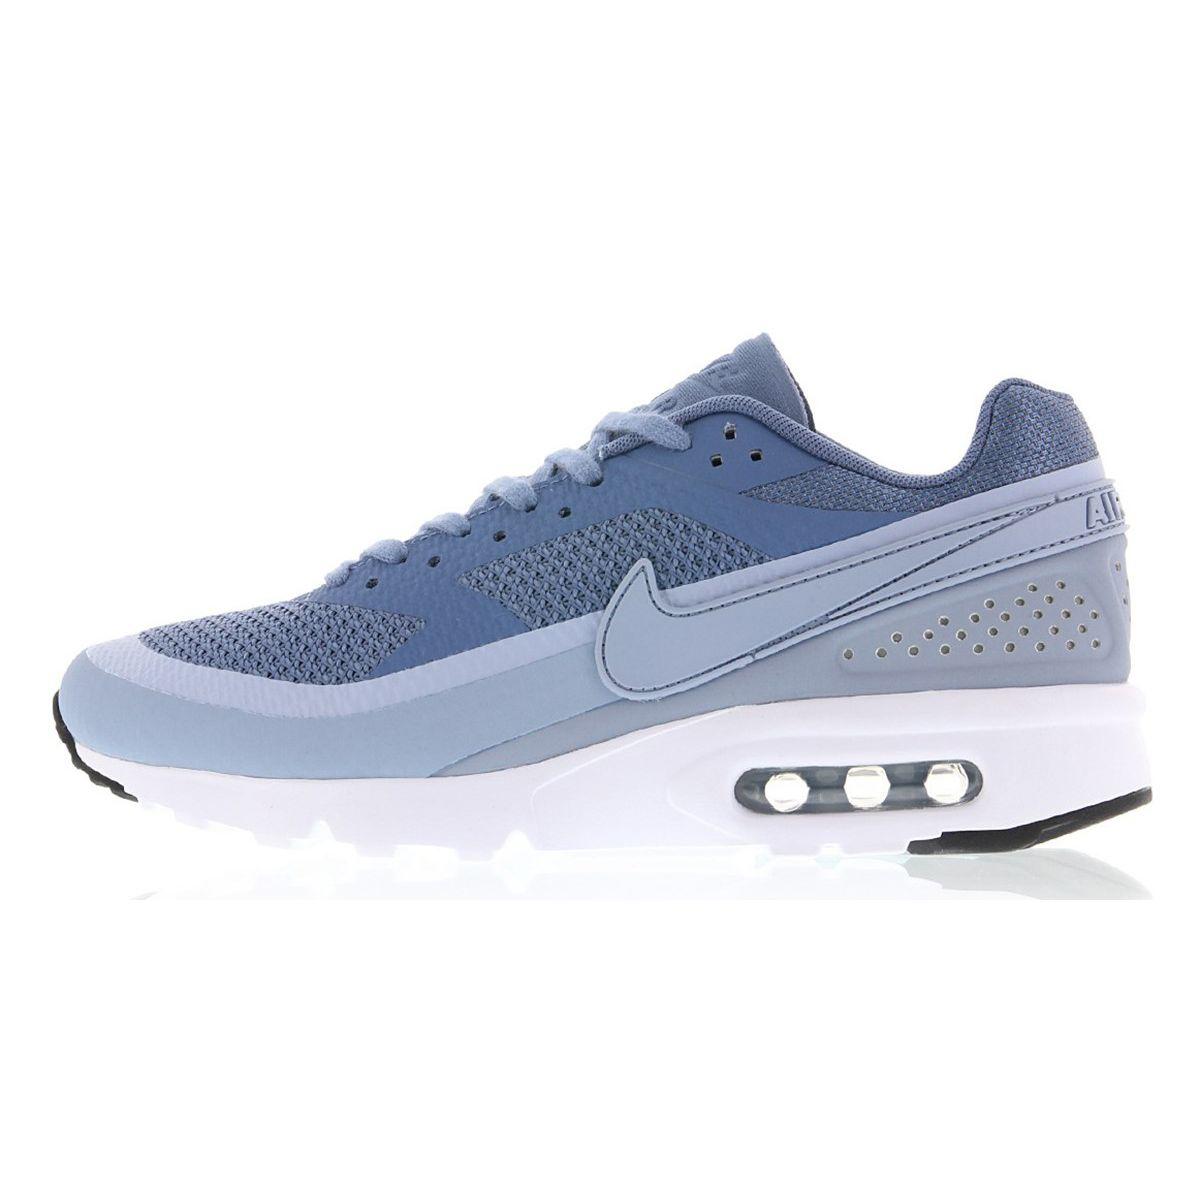 Nike Air Max Bw Ultra Spor Ayakkabısı 844967402